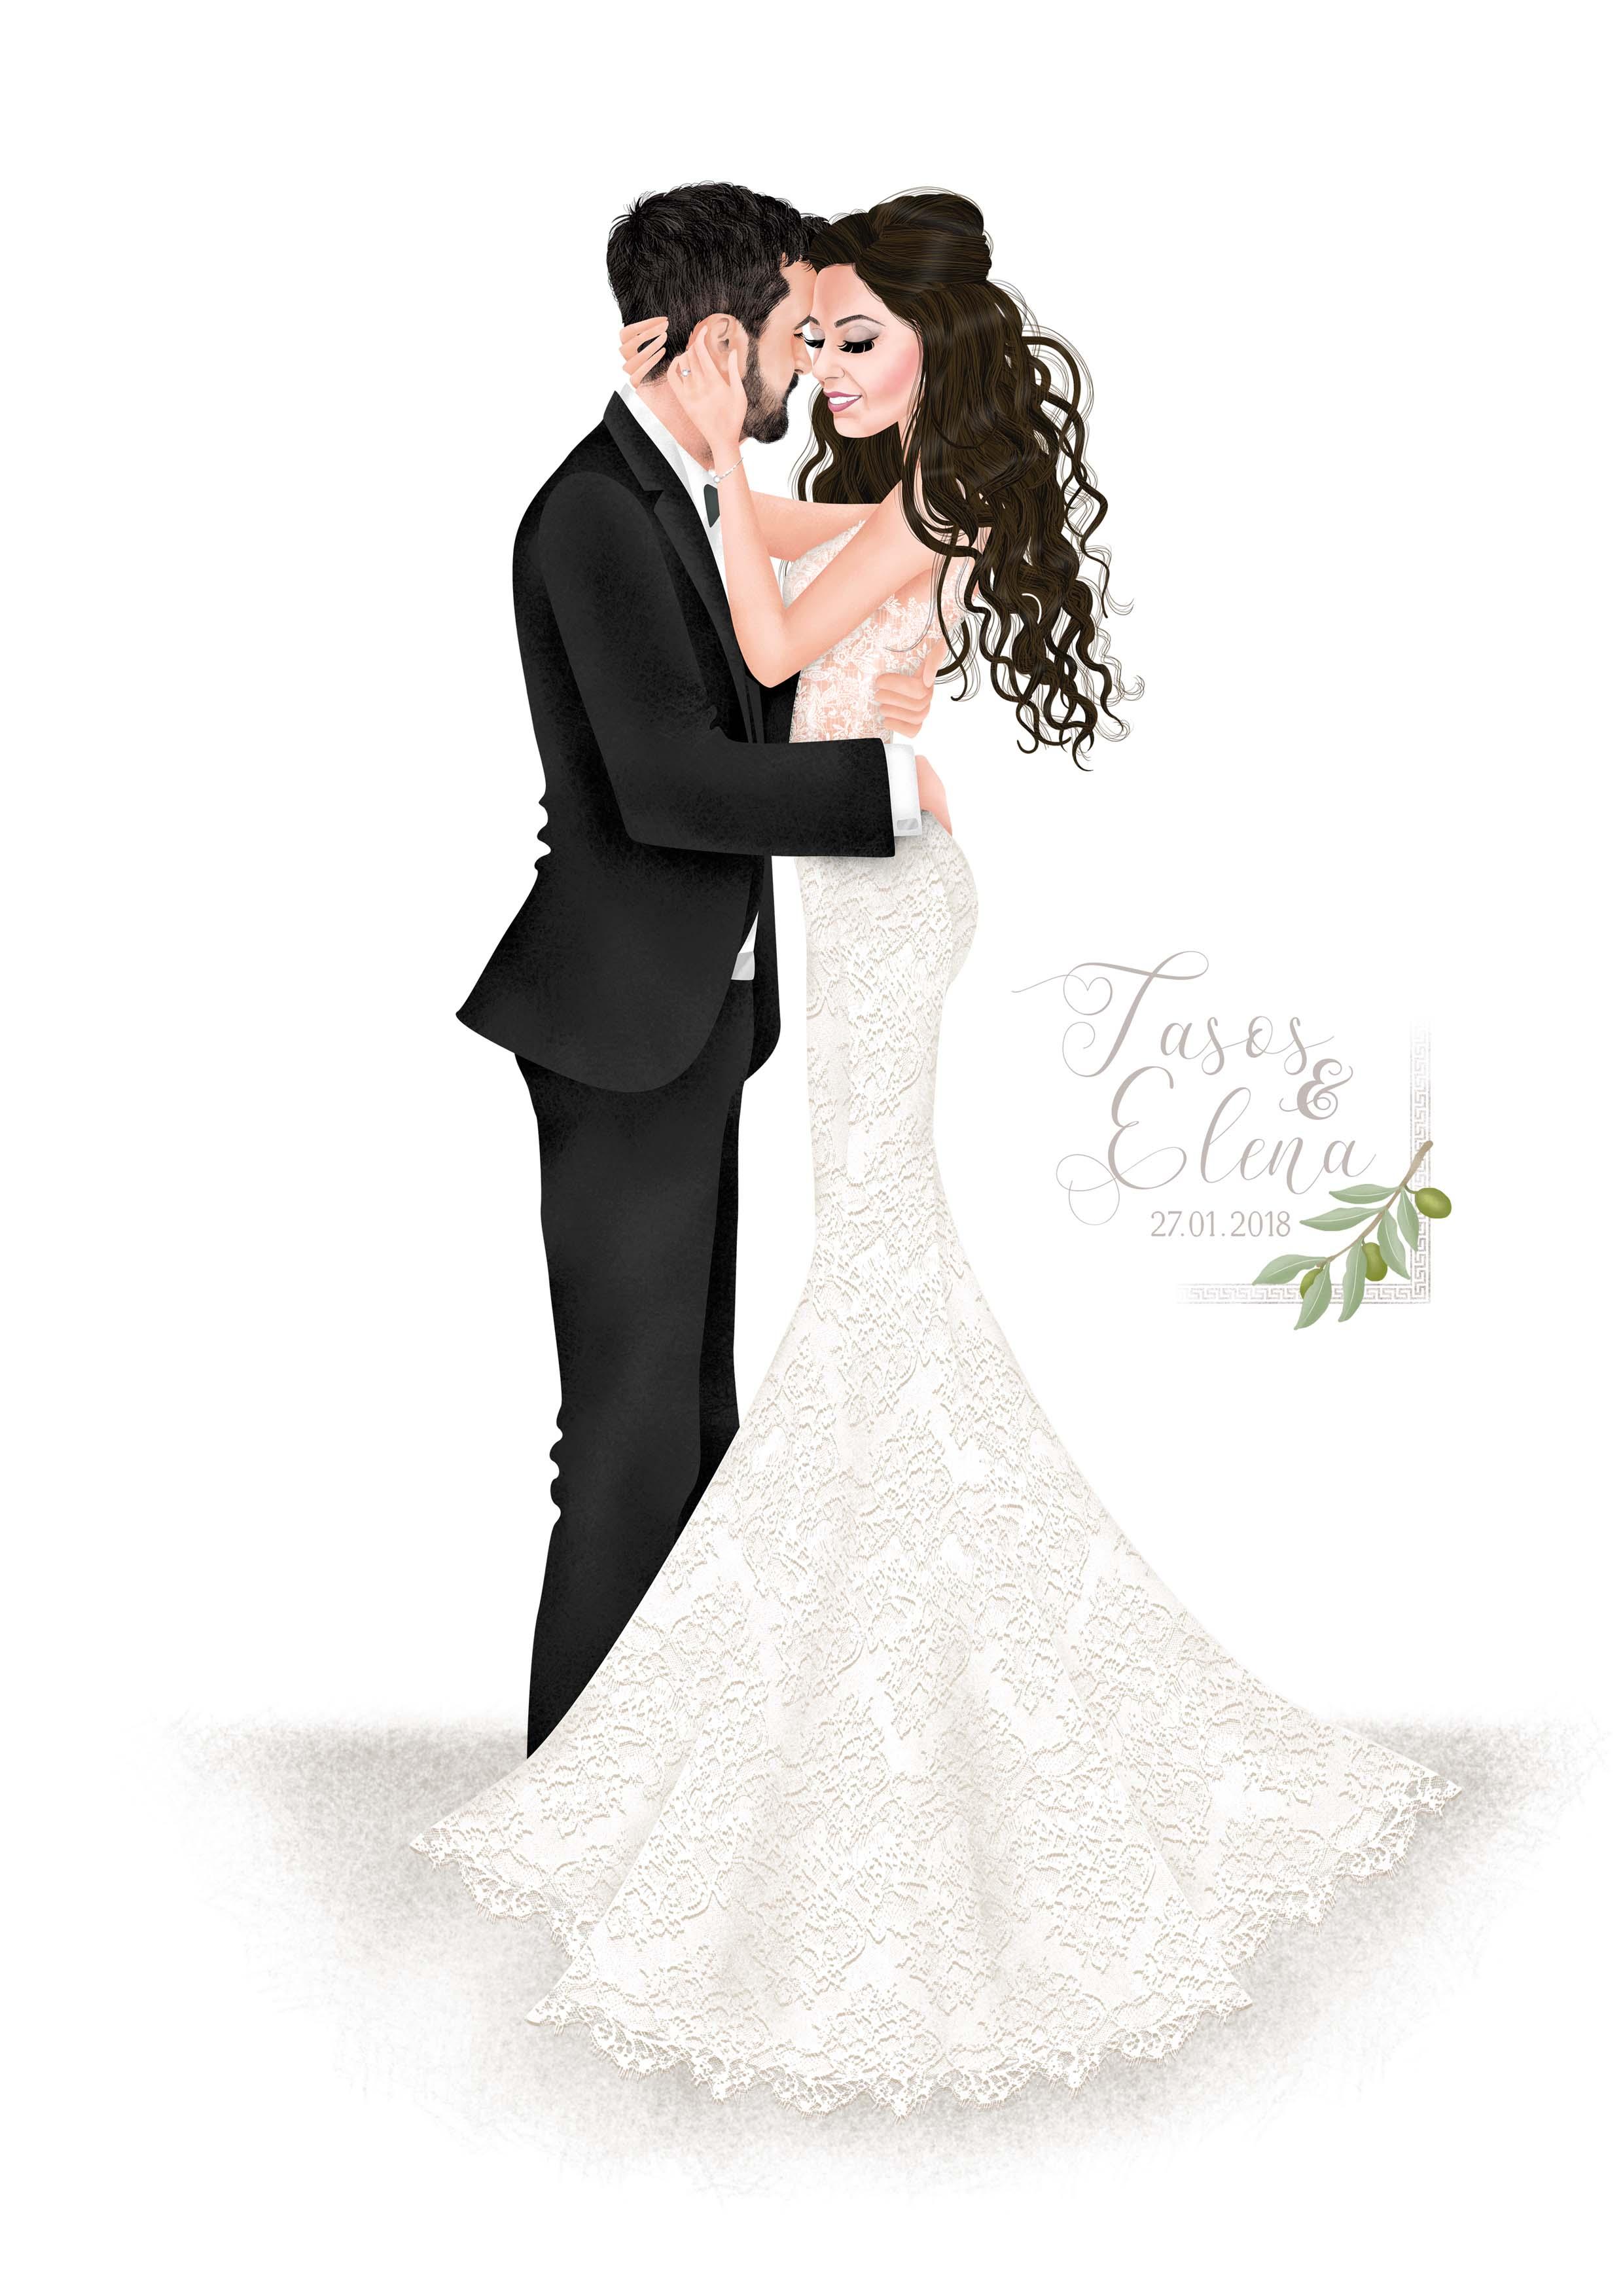 Sheena Bates - Bespoke Illustration - A4 - RGB.jpg